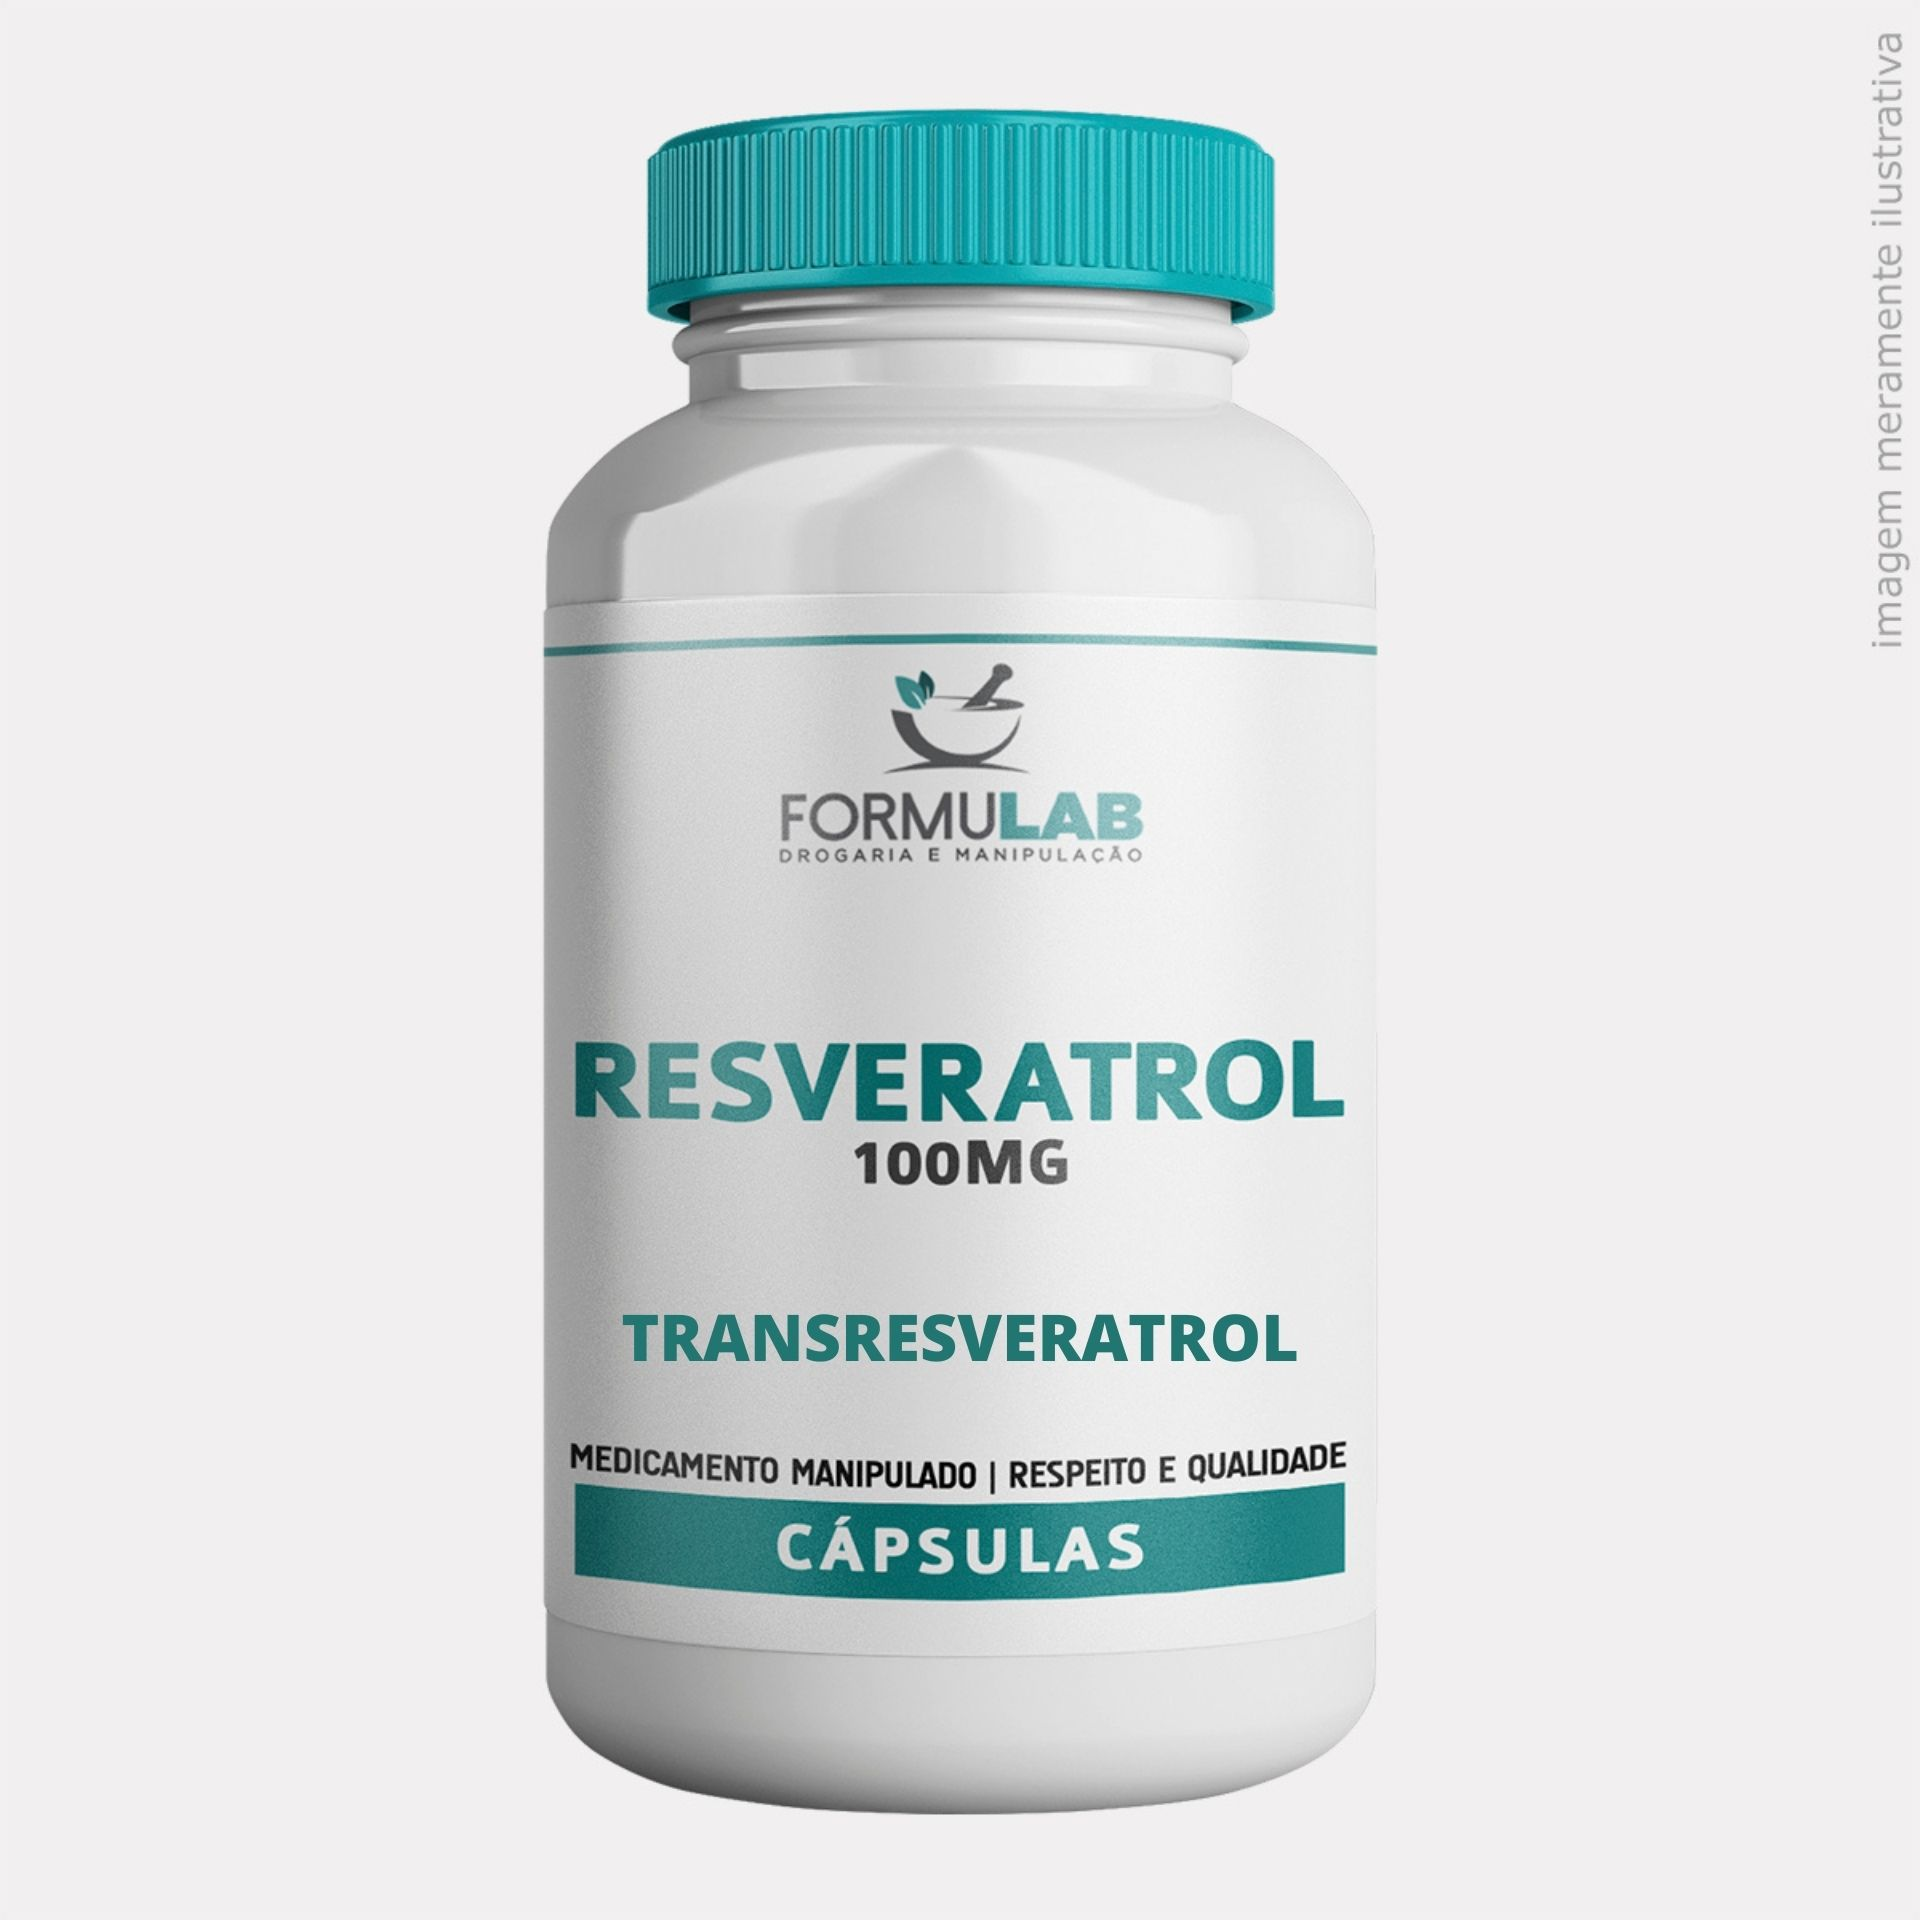 Transresveratrol 100mg - Resveratrol